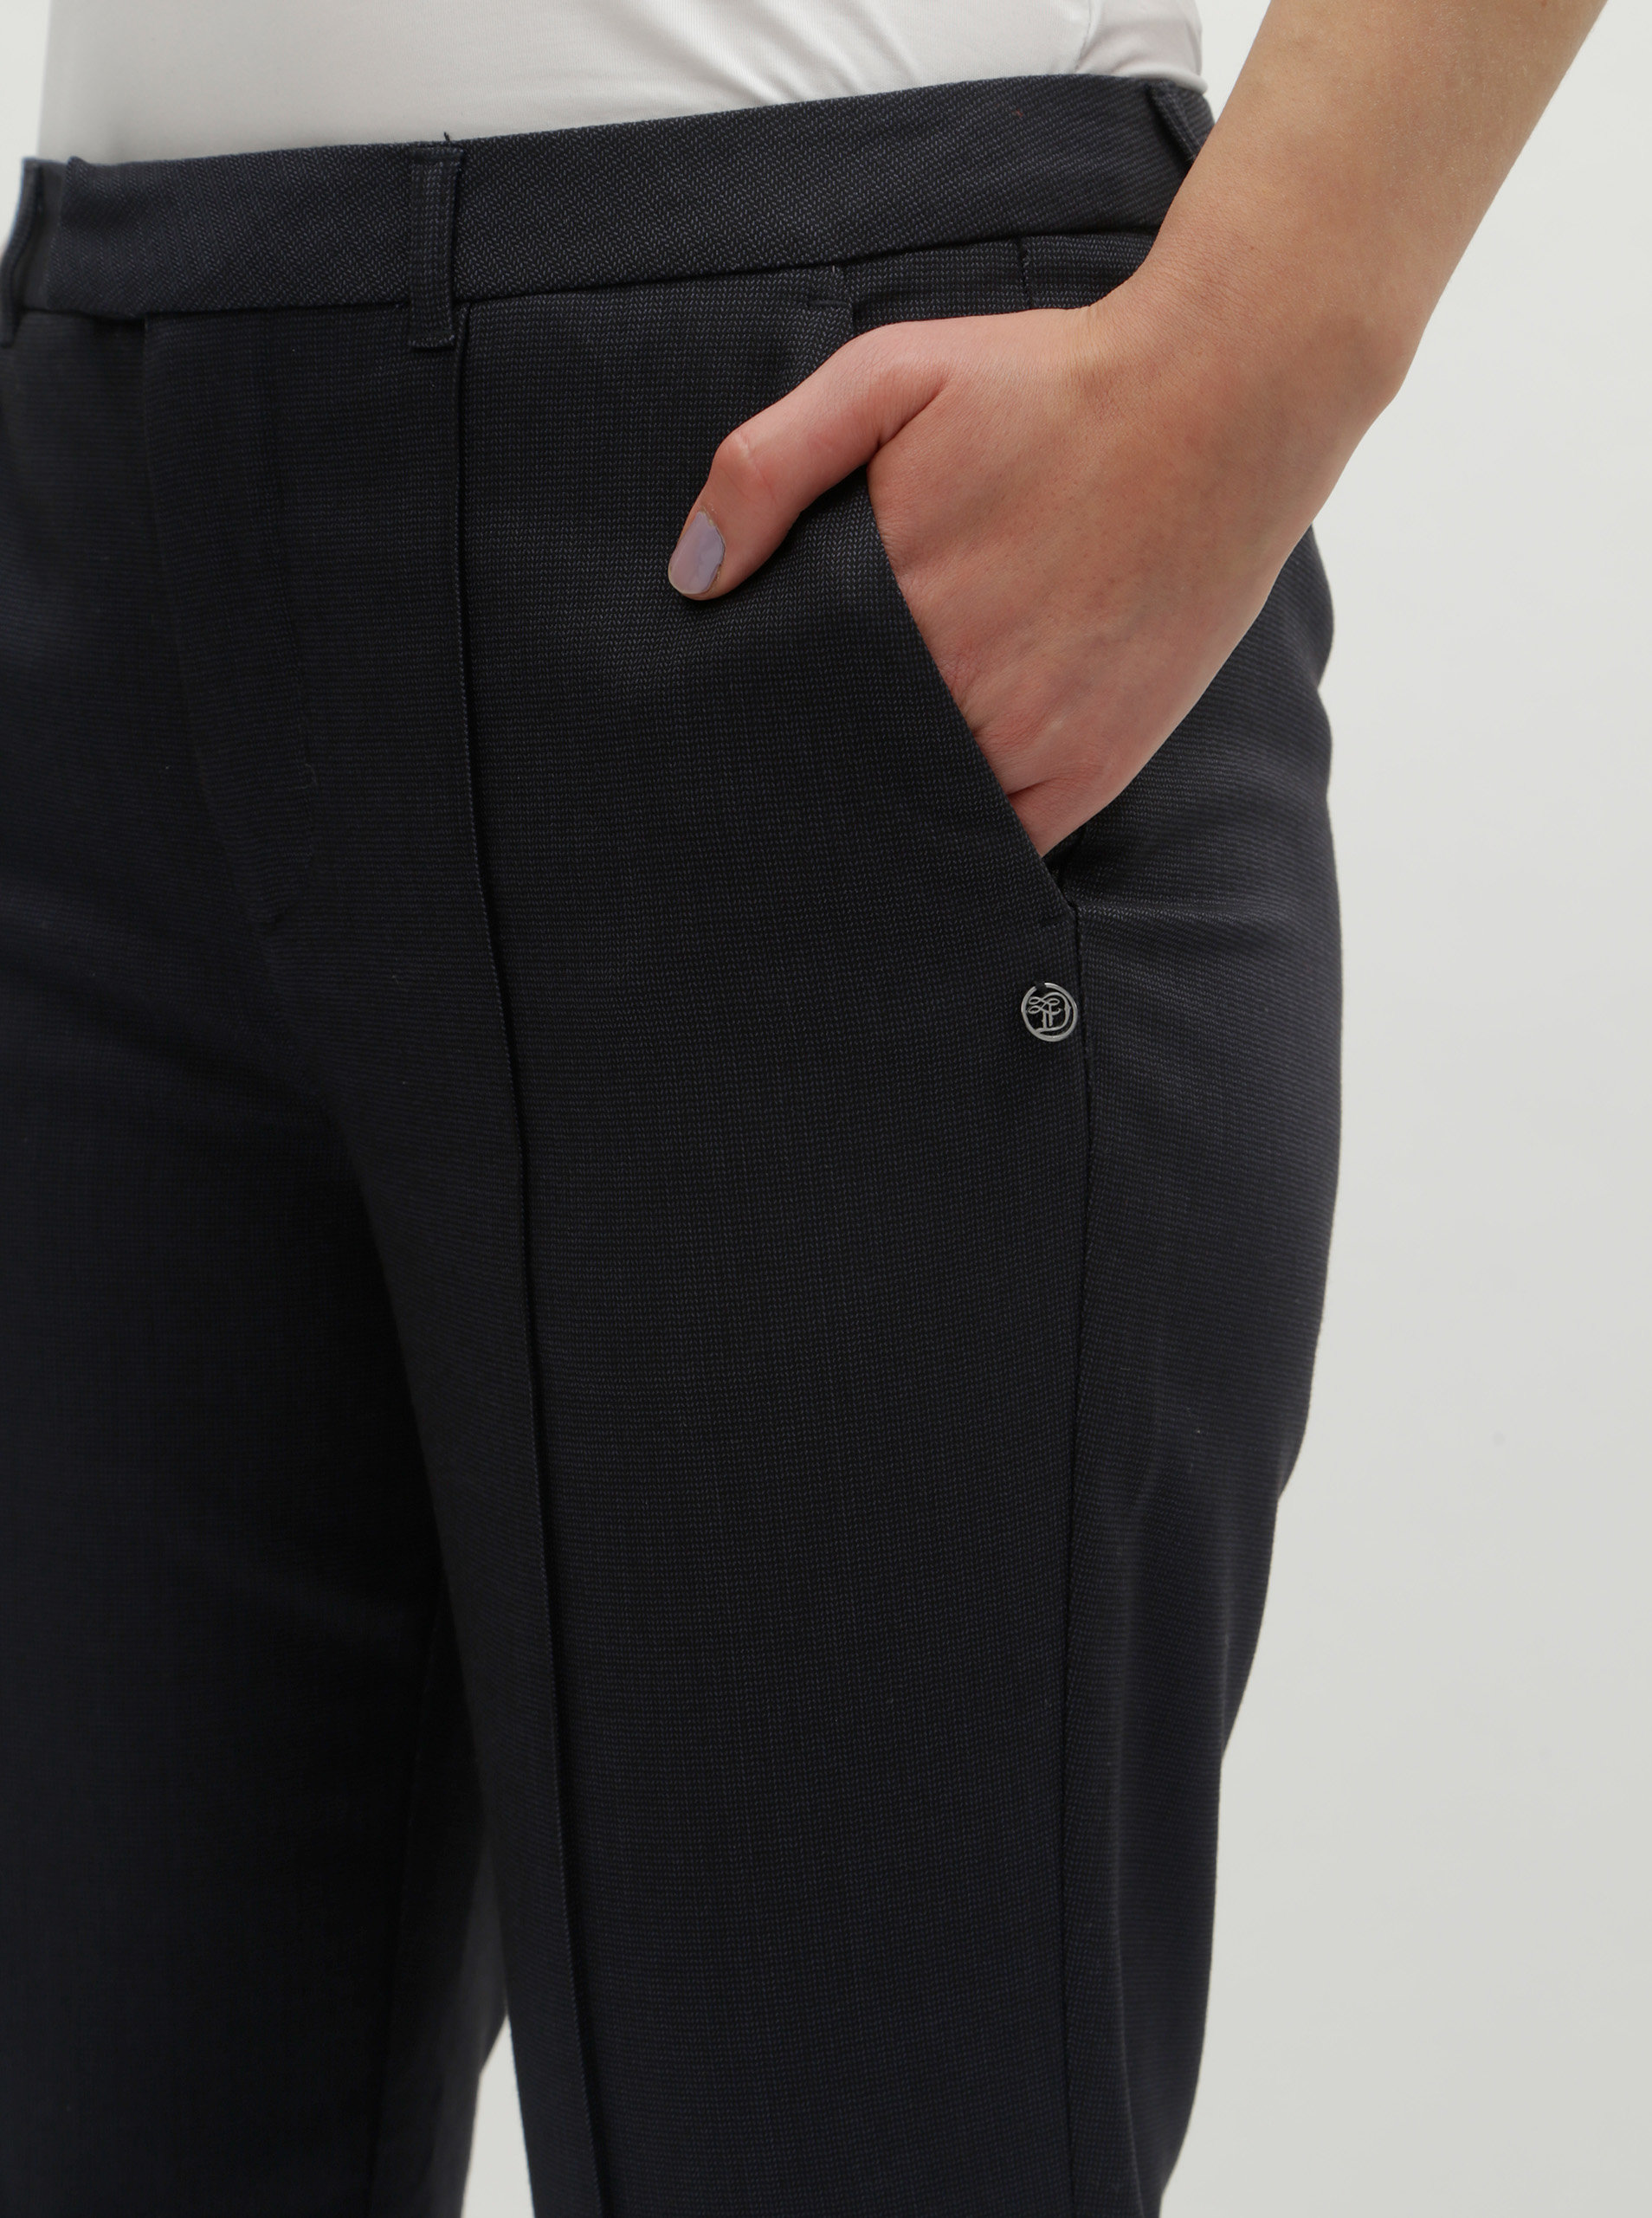 244b400f2260 Tmavomodré dámske skrátené nohavice Tom Tailor Denim ...